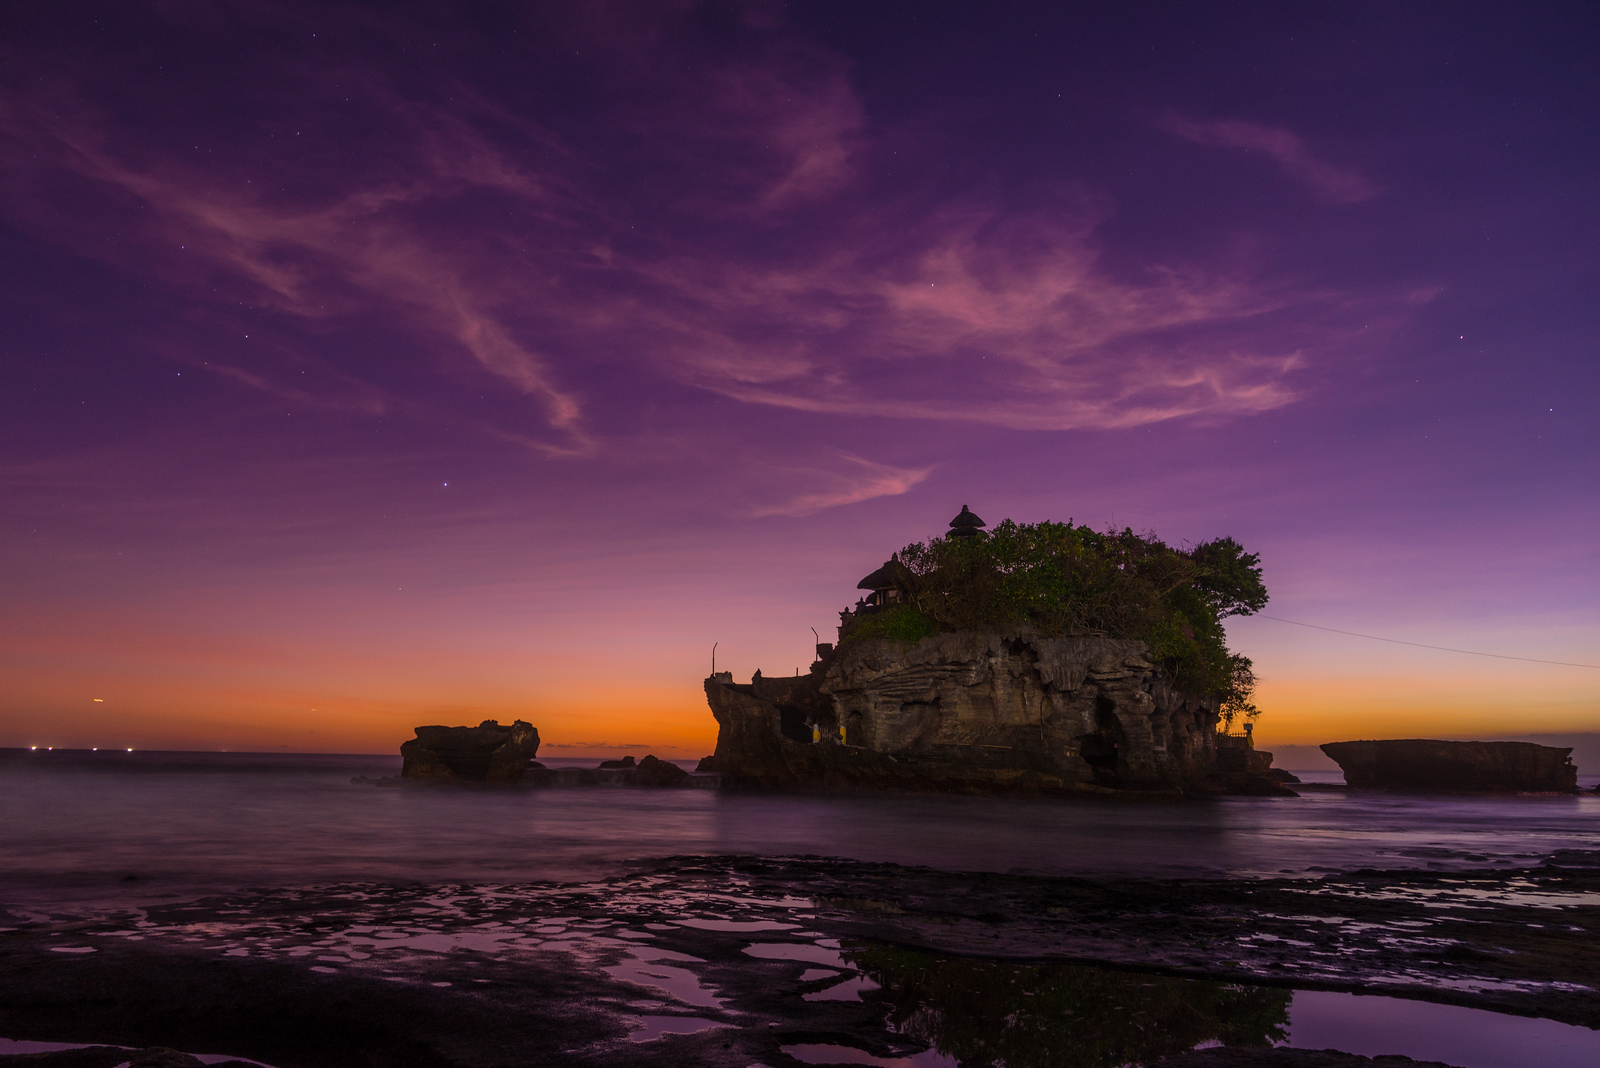 Tanah Lot Sunset to Night Purple Hues